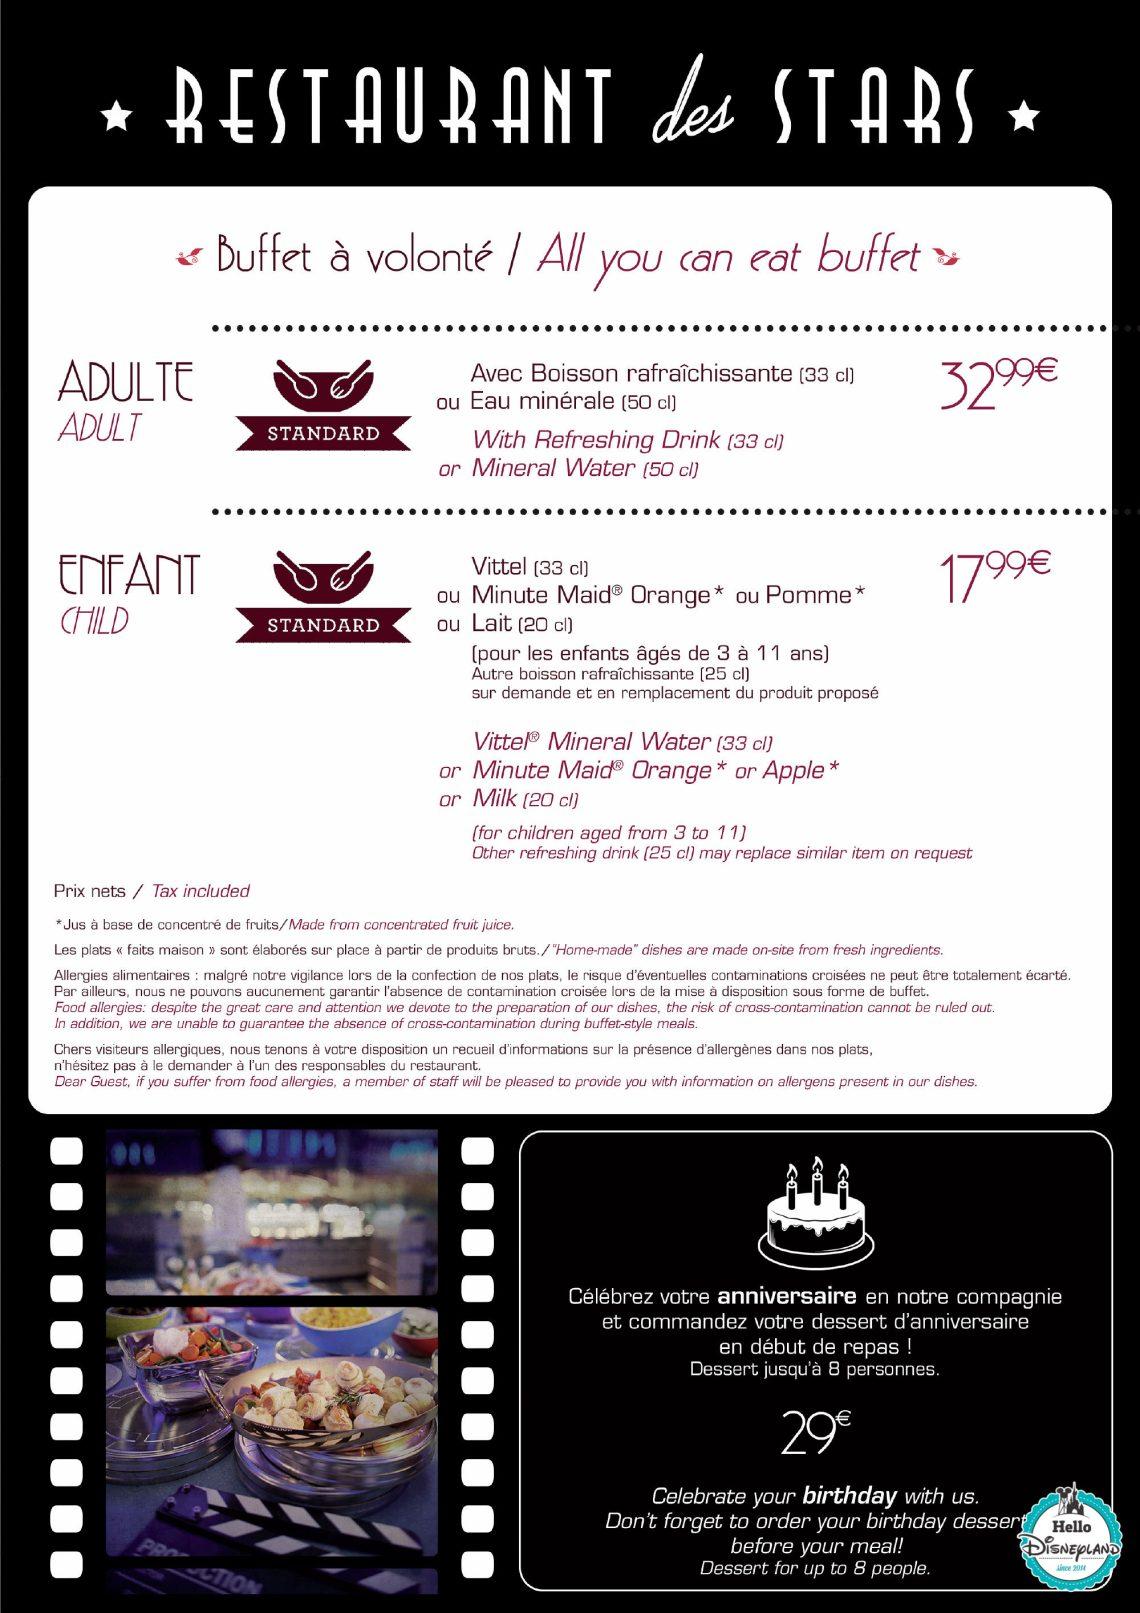 Restaurantsdes stars - Menu Restaurant 2015 - 2016 Disneyland Paris